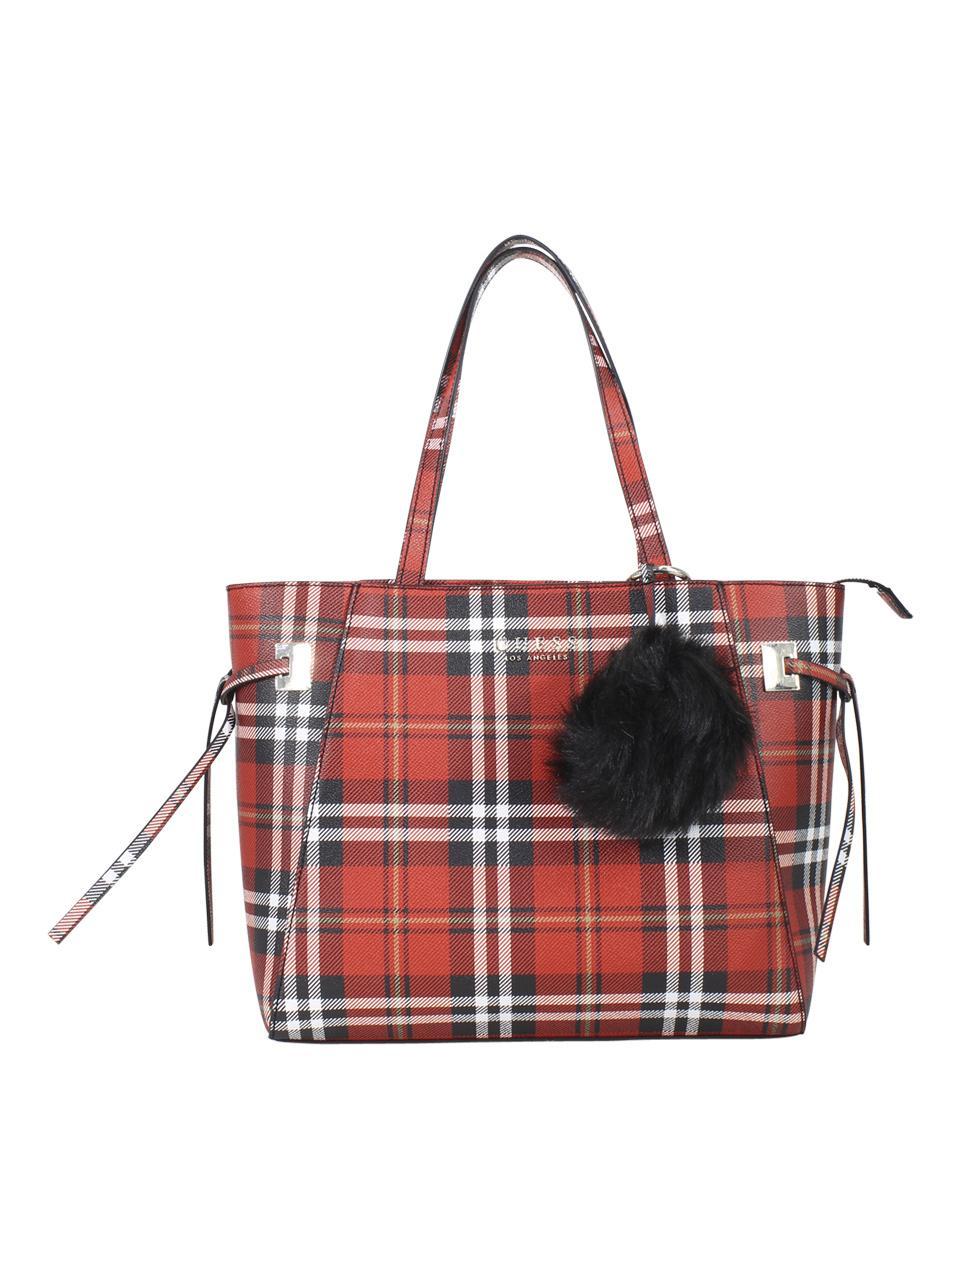 Guess Women's Lizzy Tote Handbag